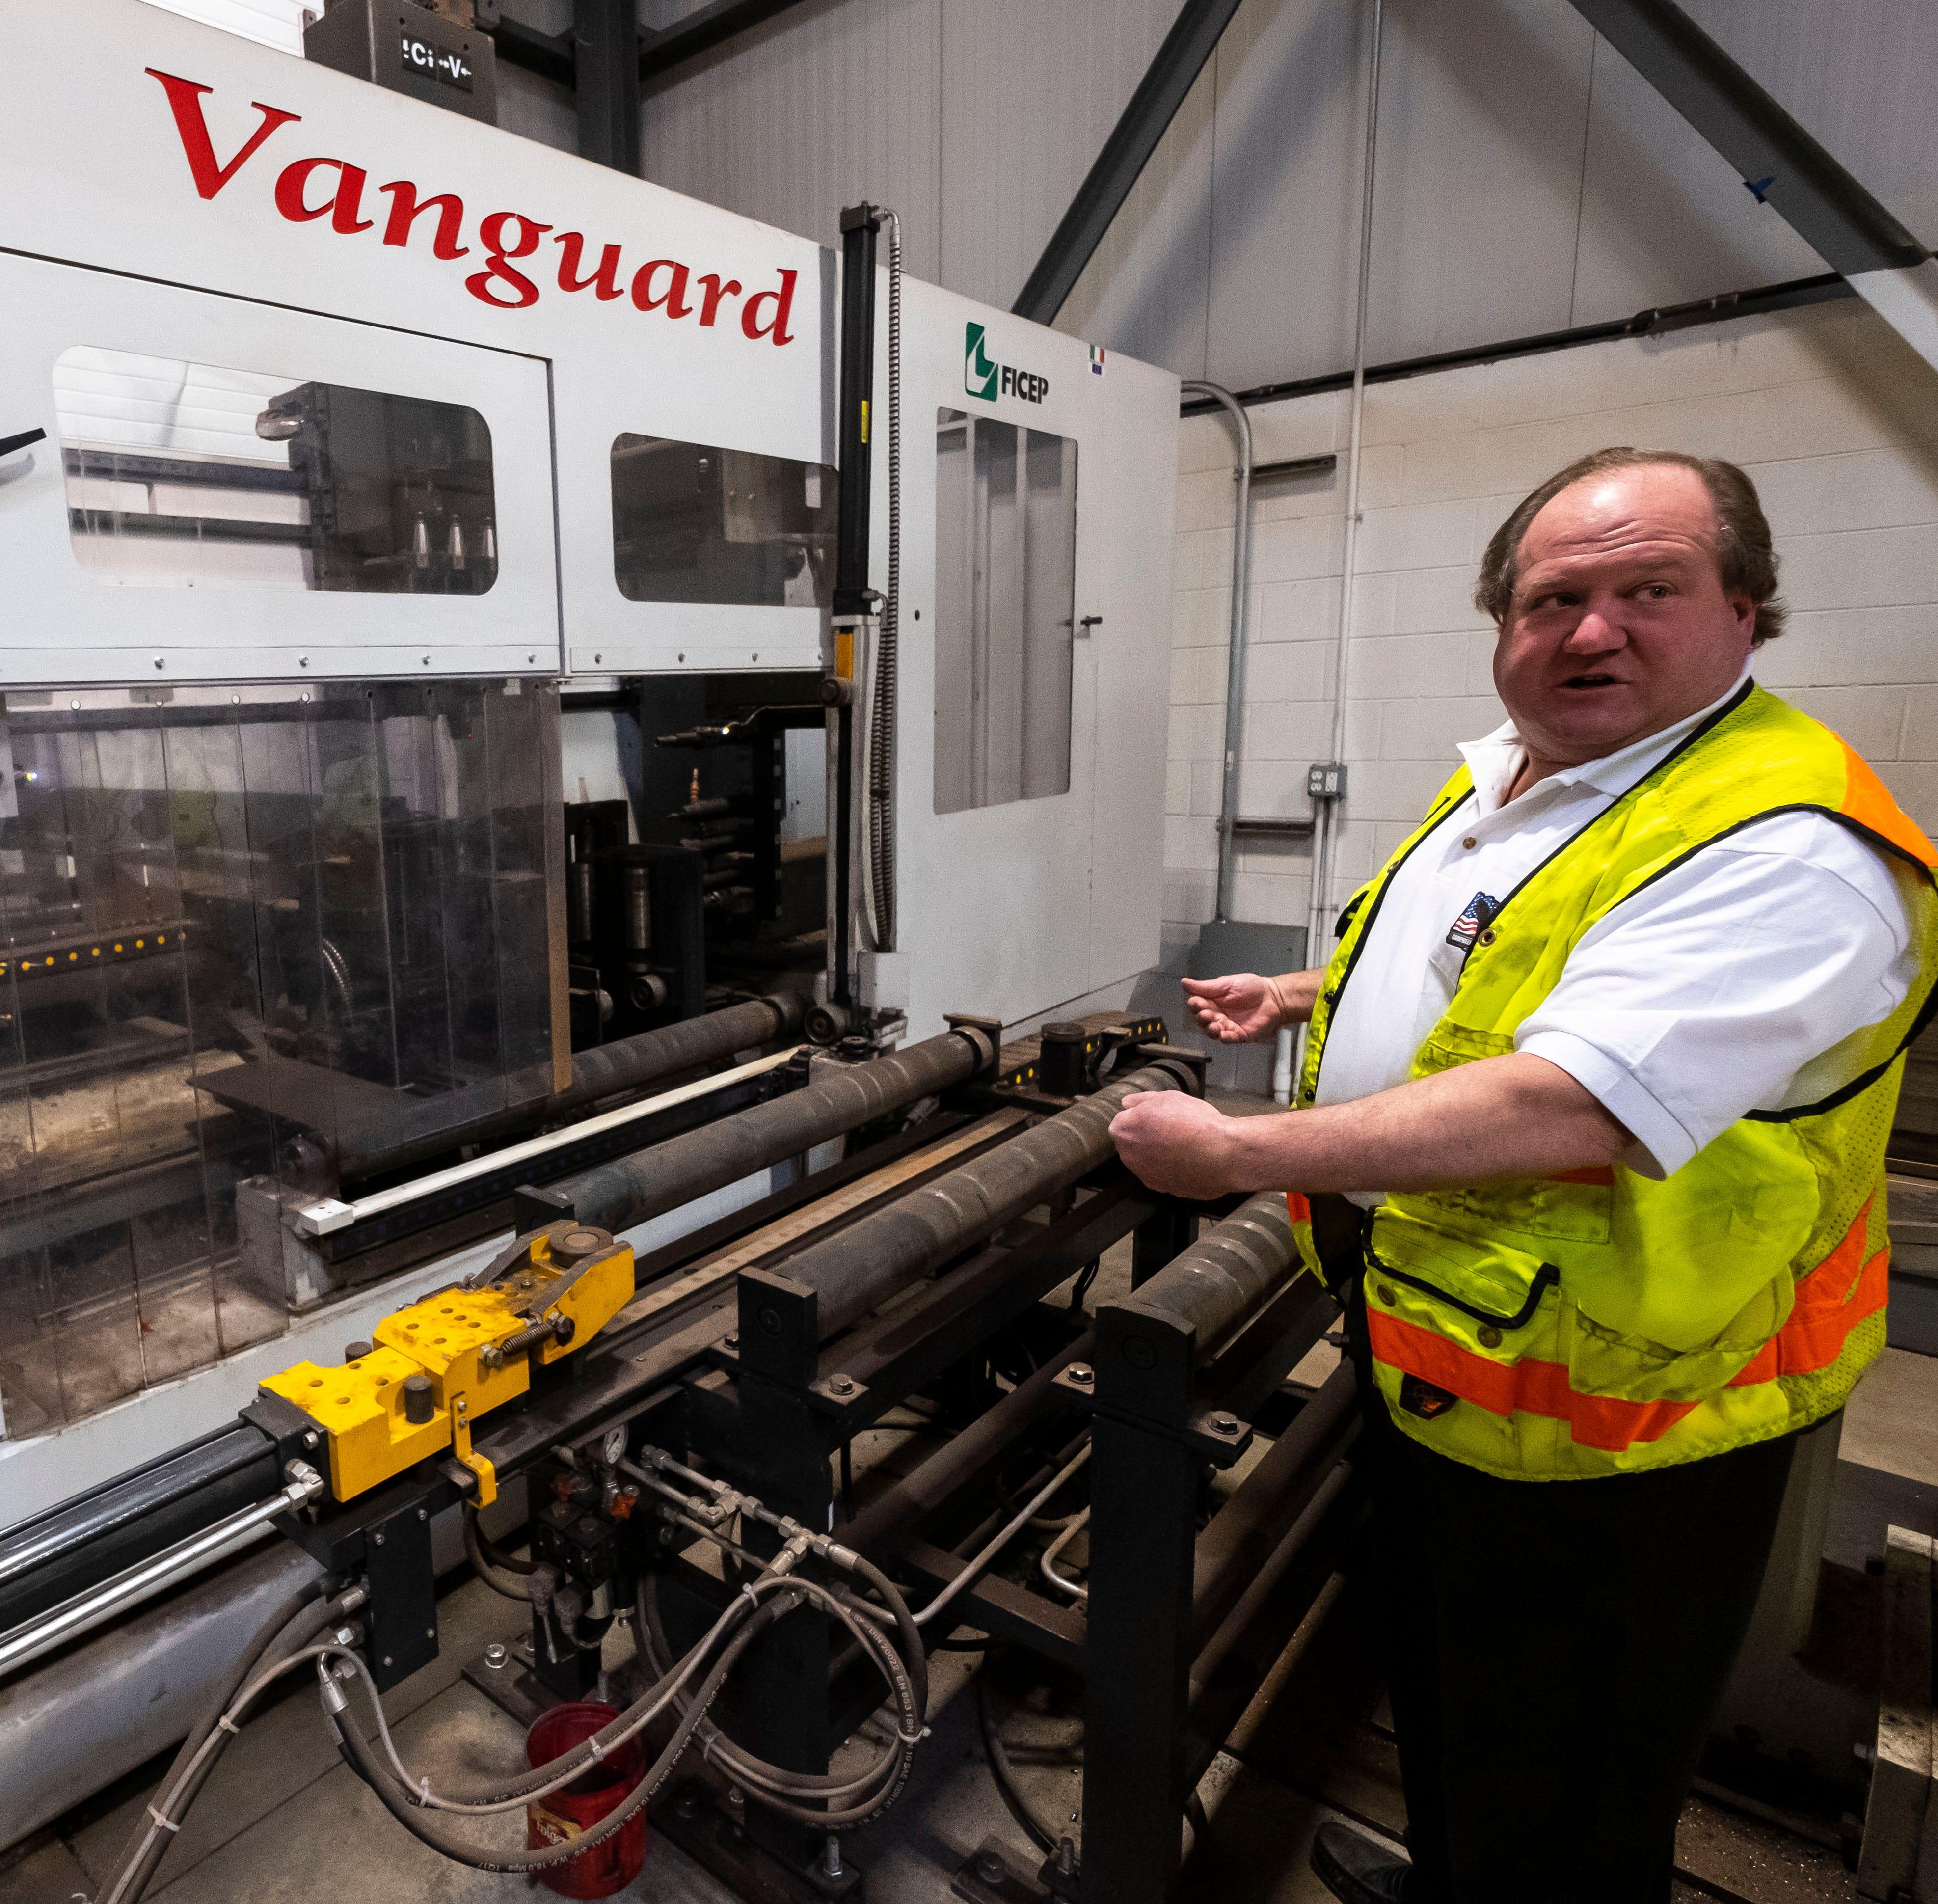 Marysville fabricator named among Michigan's 50 companies to watch